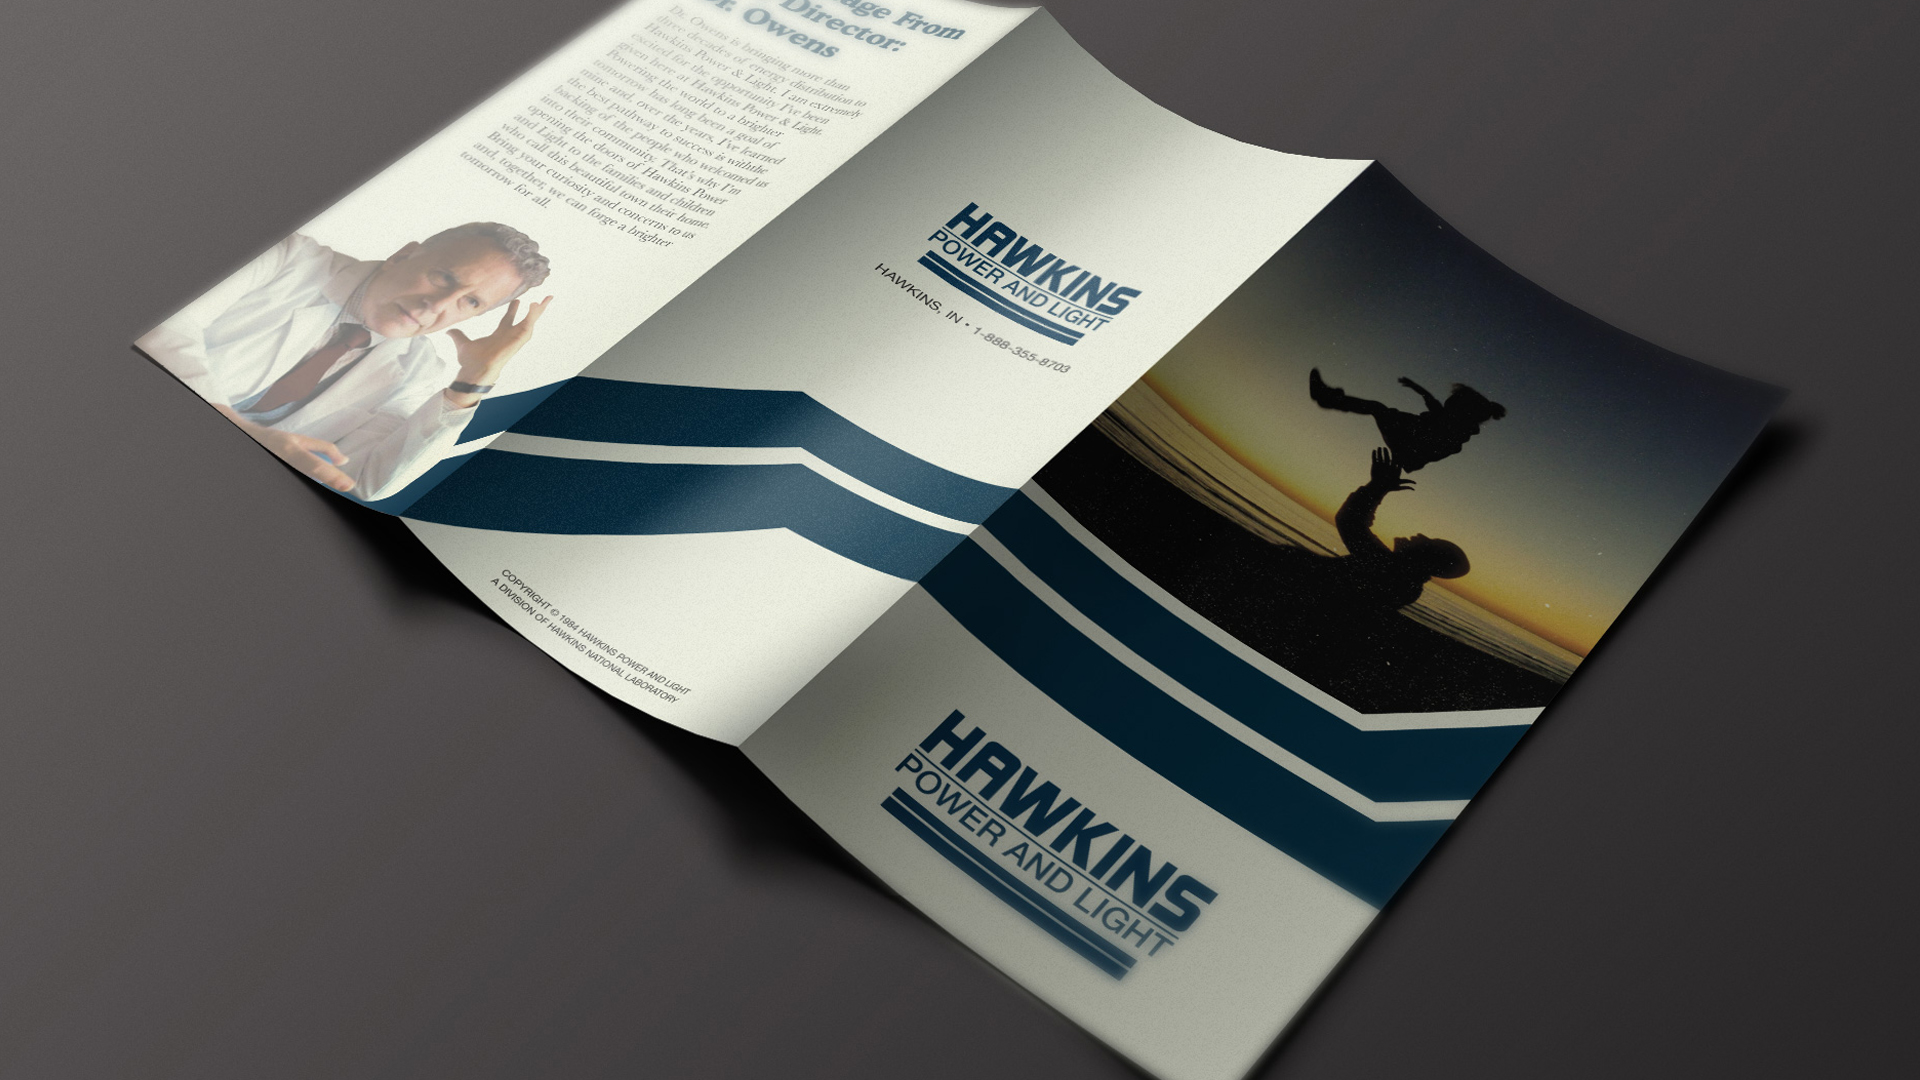 NTFLX_sts2_brochure_inSitu_comp_v3_1920x1080